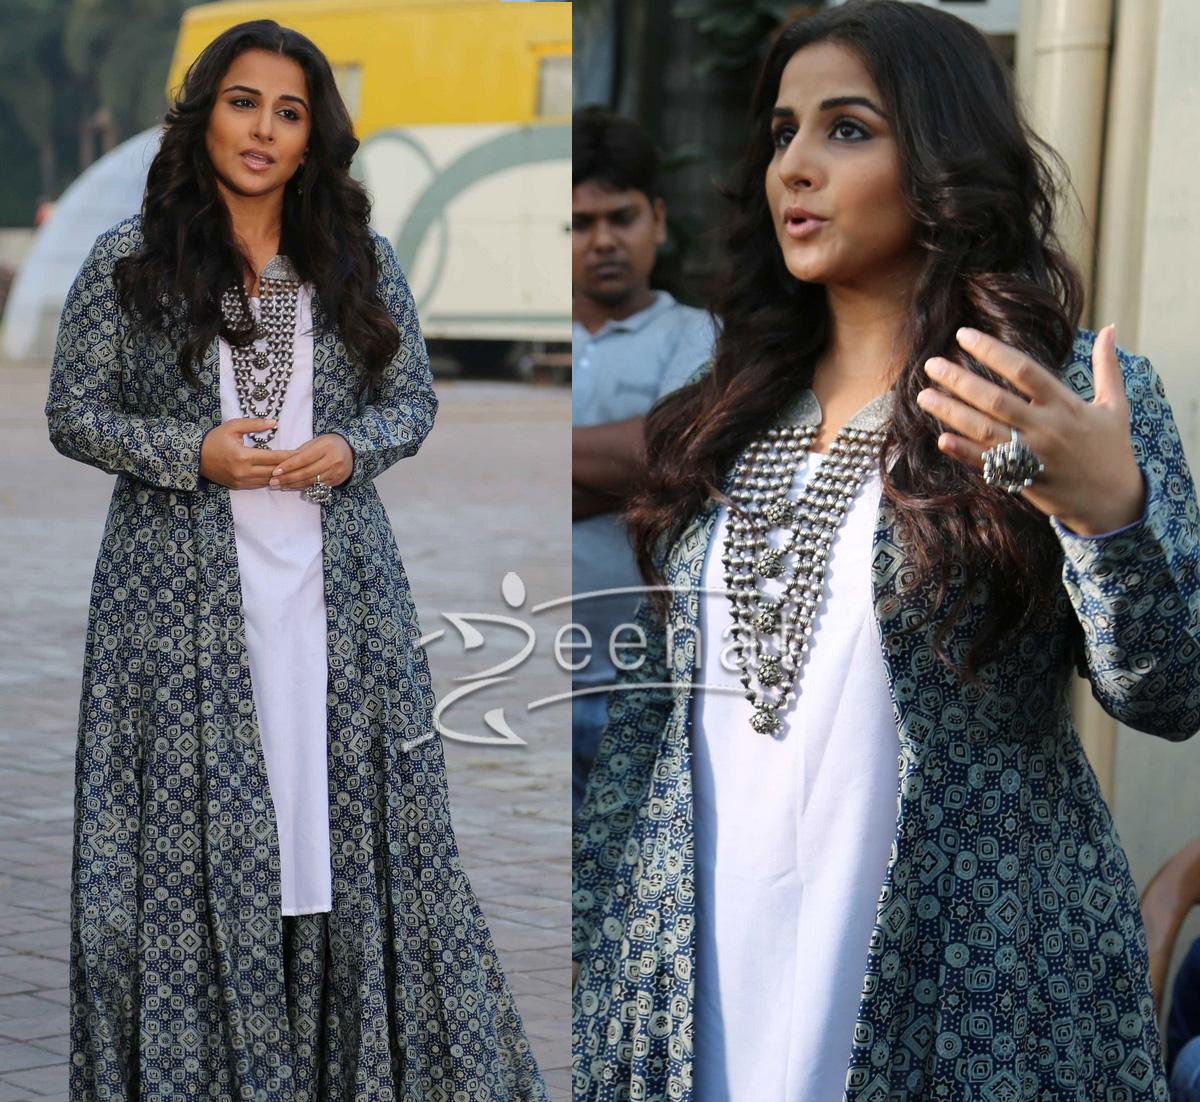 Vidya Balan In Zoraya Dress For Kahaani 2 Promotions